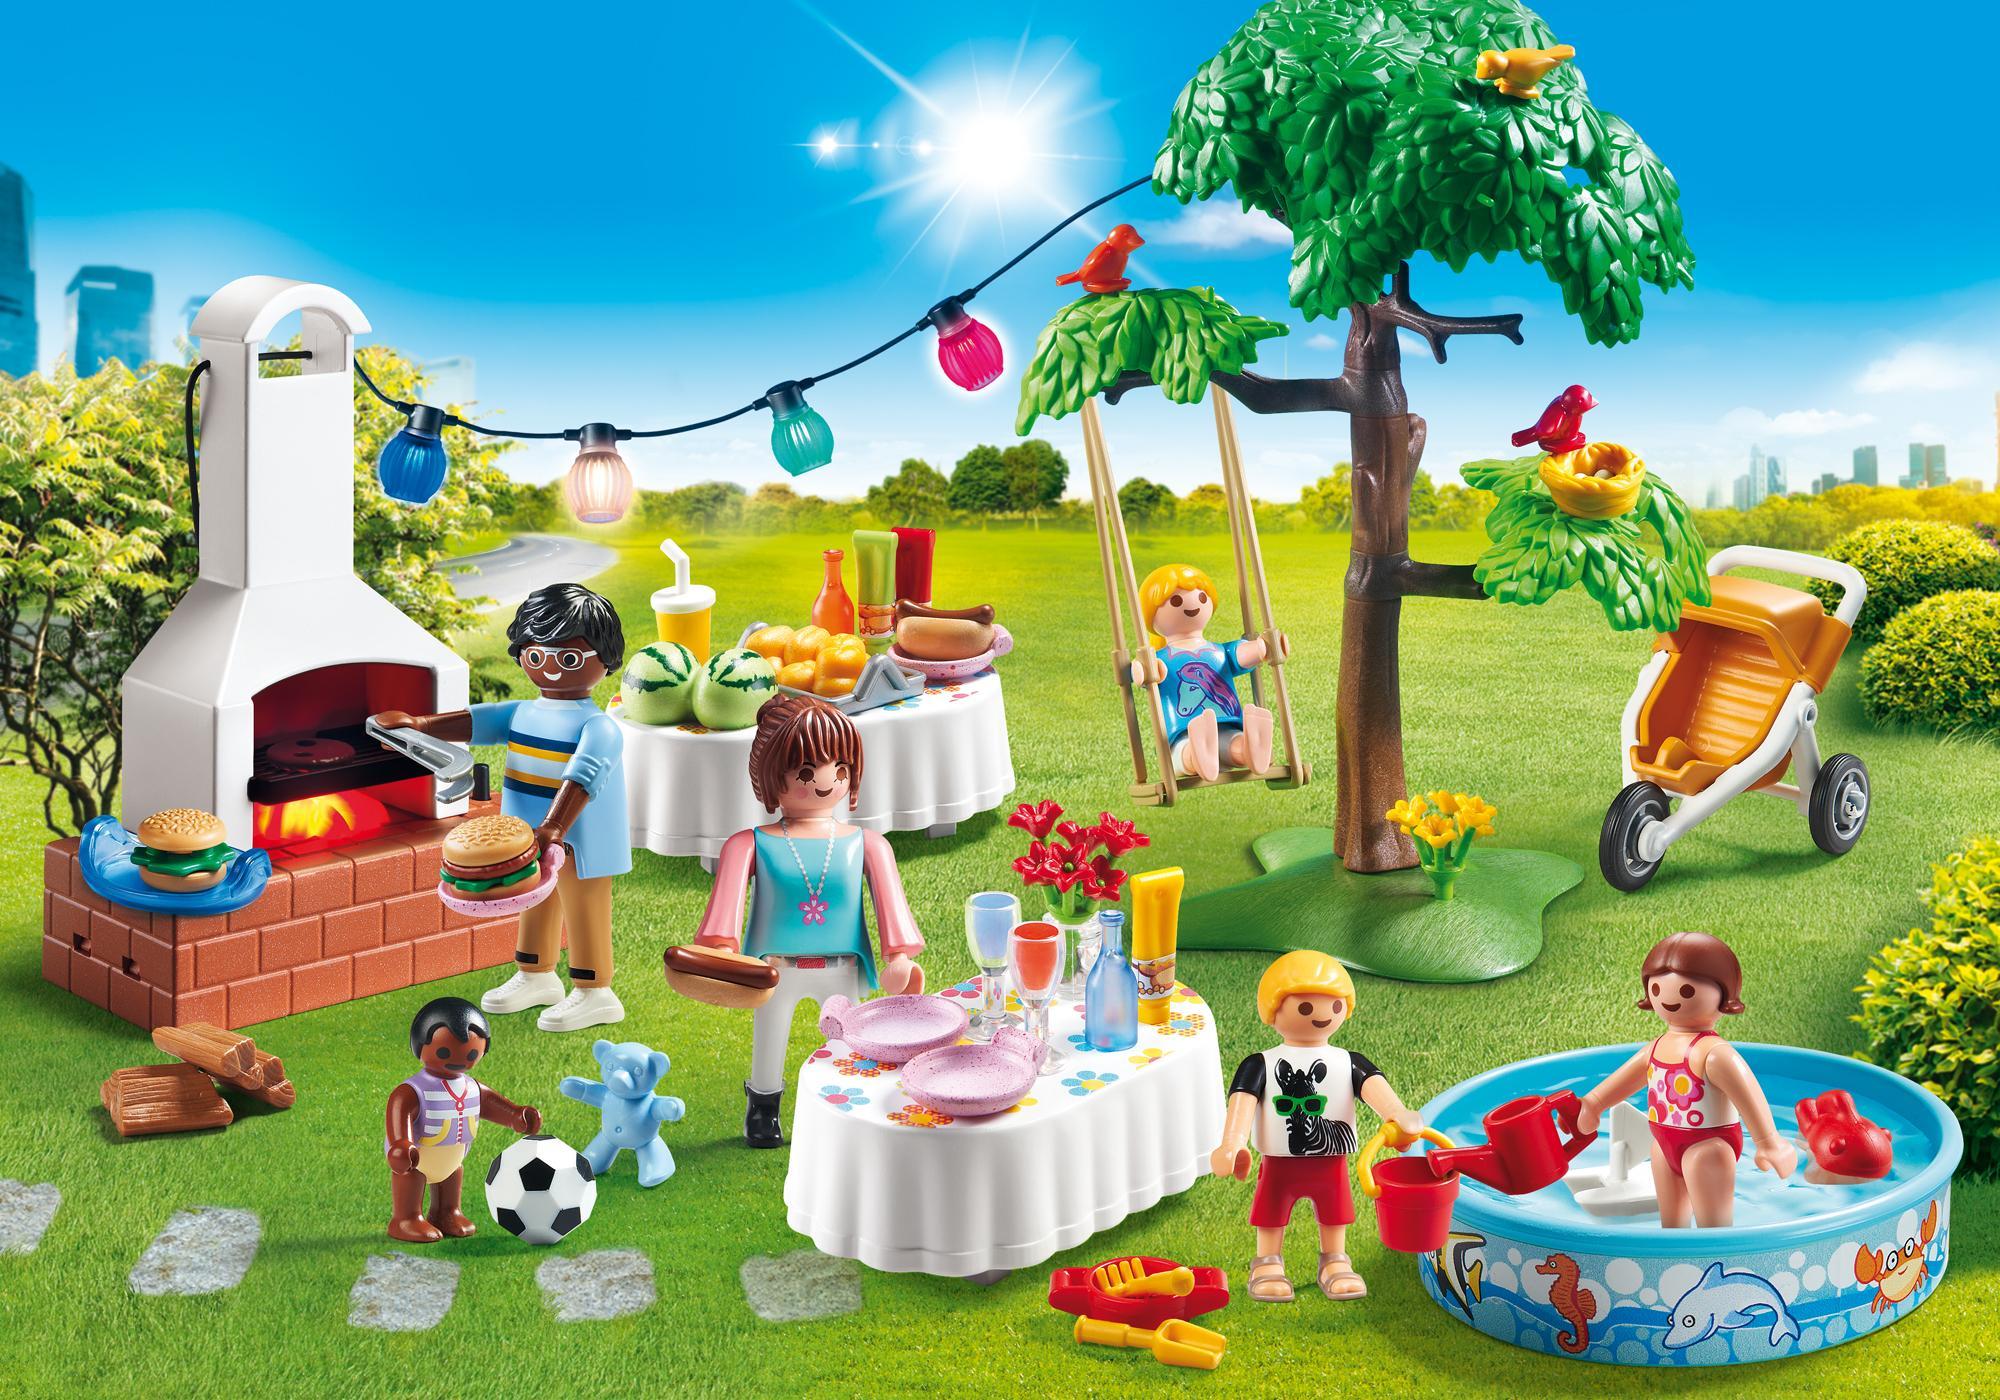 http://media.playmobil.com/i/playmobil/9272_product_detail/Housewarming Party